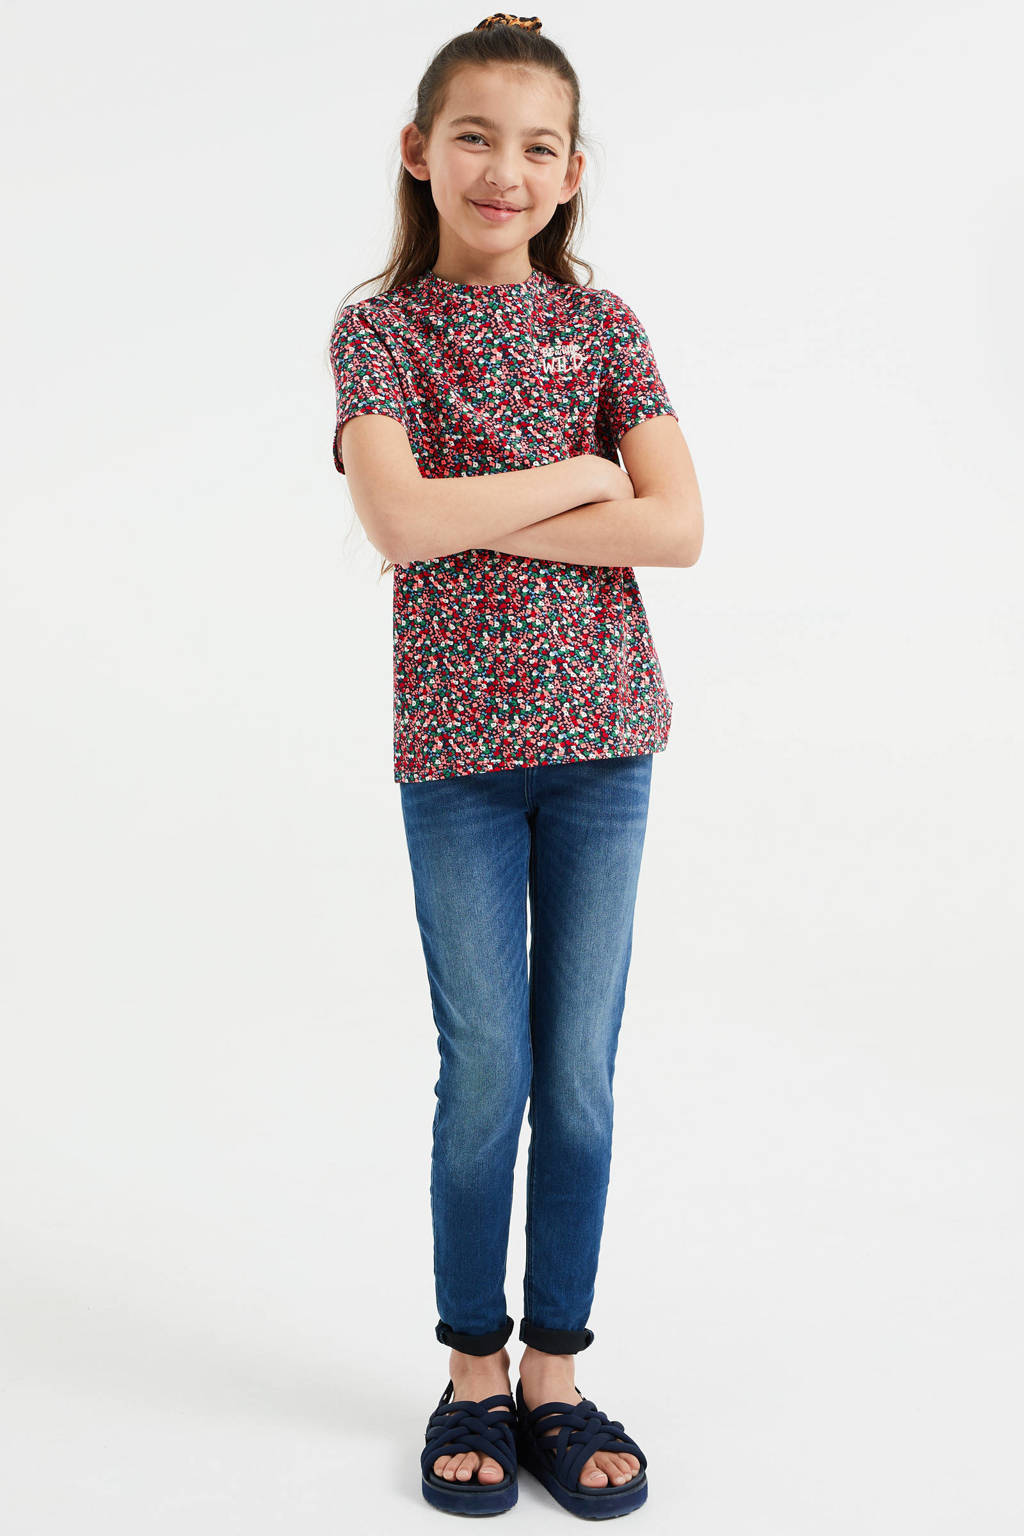 WE Fashion T-shirt - set van 2 kaki groen/roze, Kaki groen/roze